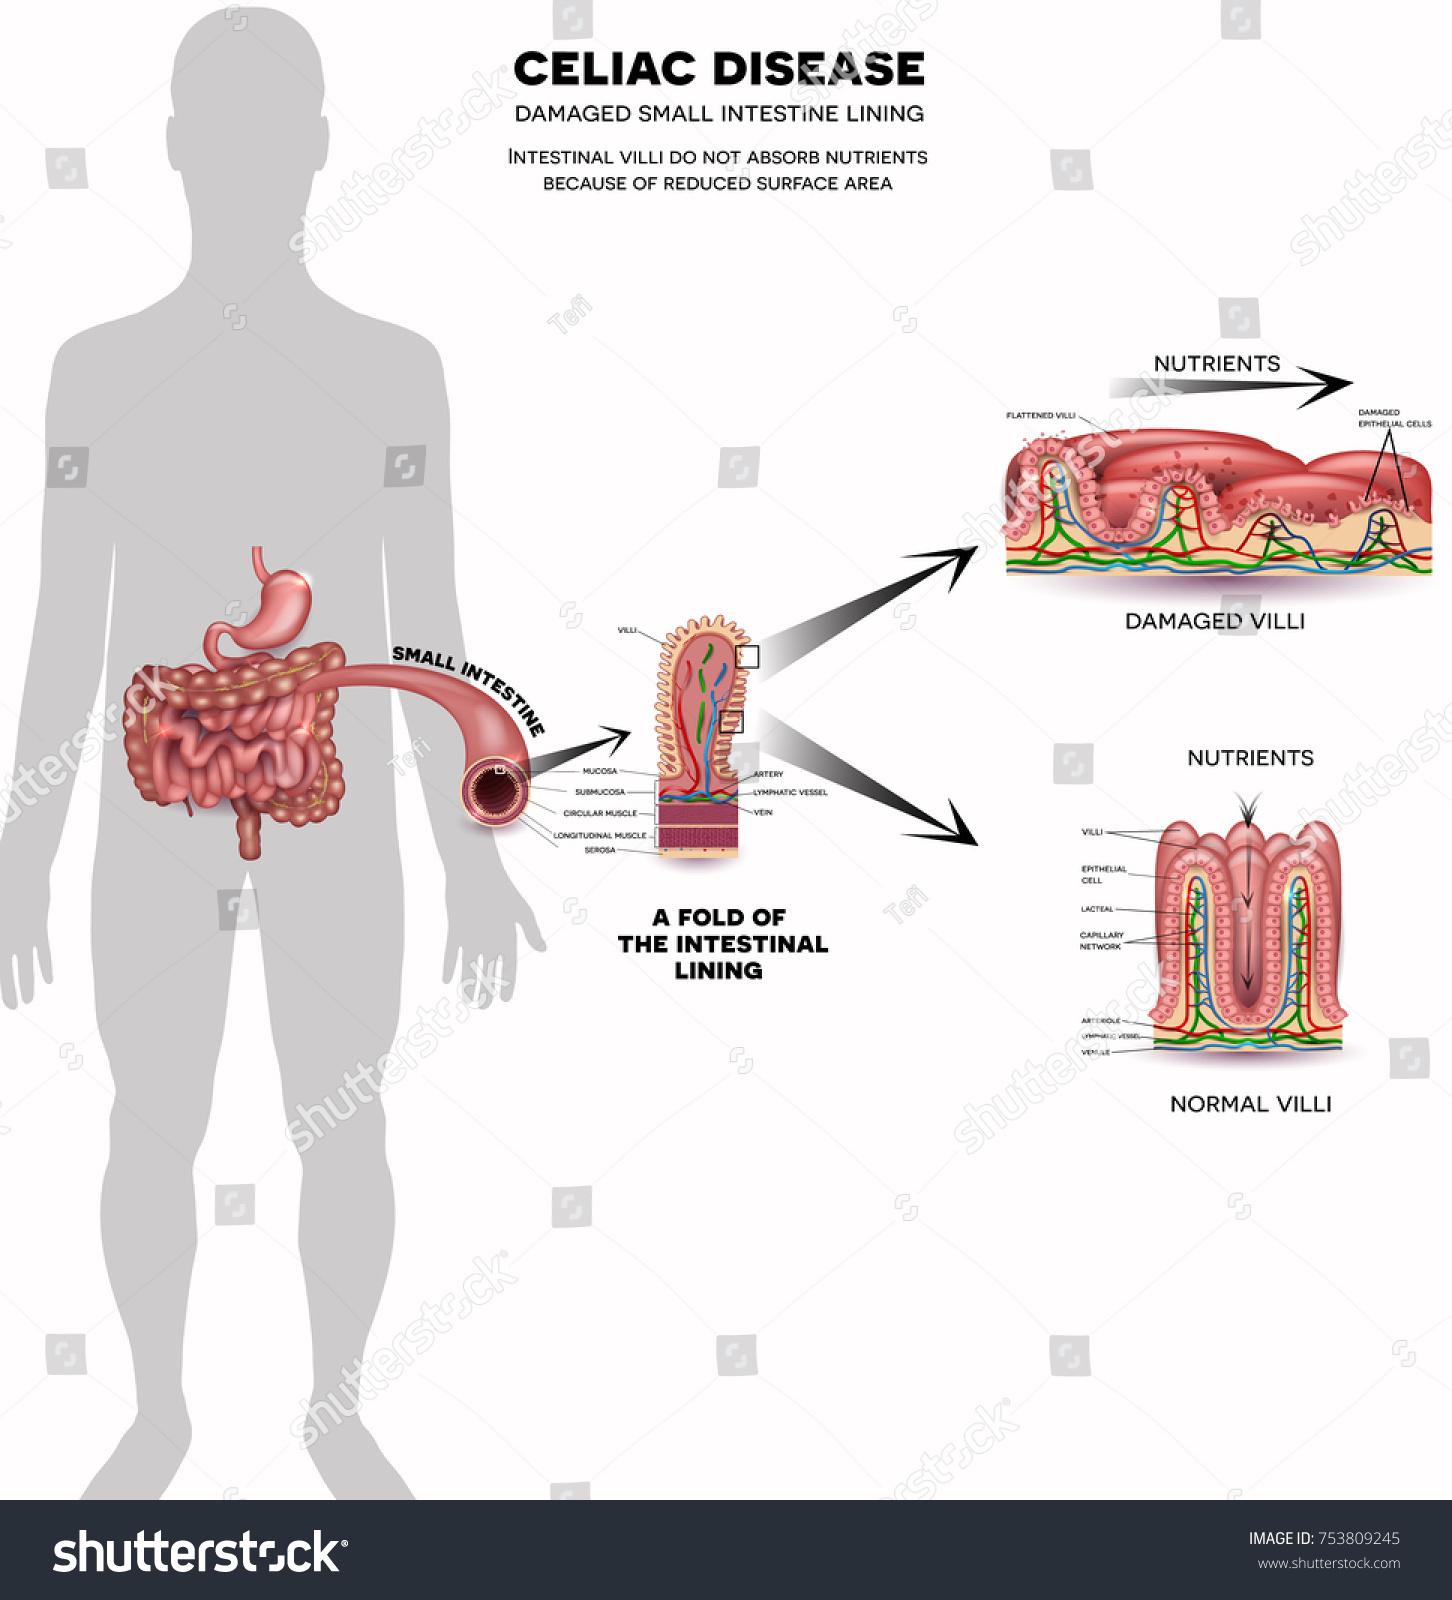 Celiac Disease Affected Small Intestine Villi Stock Illustration